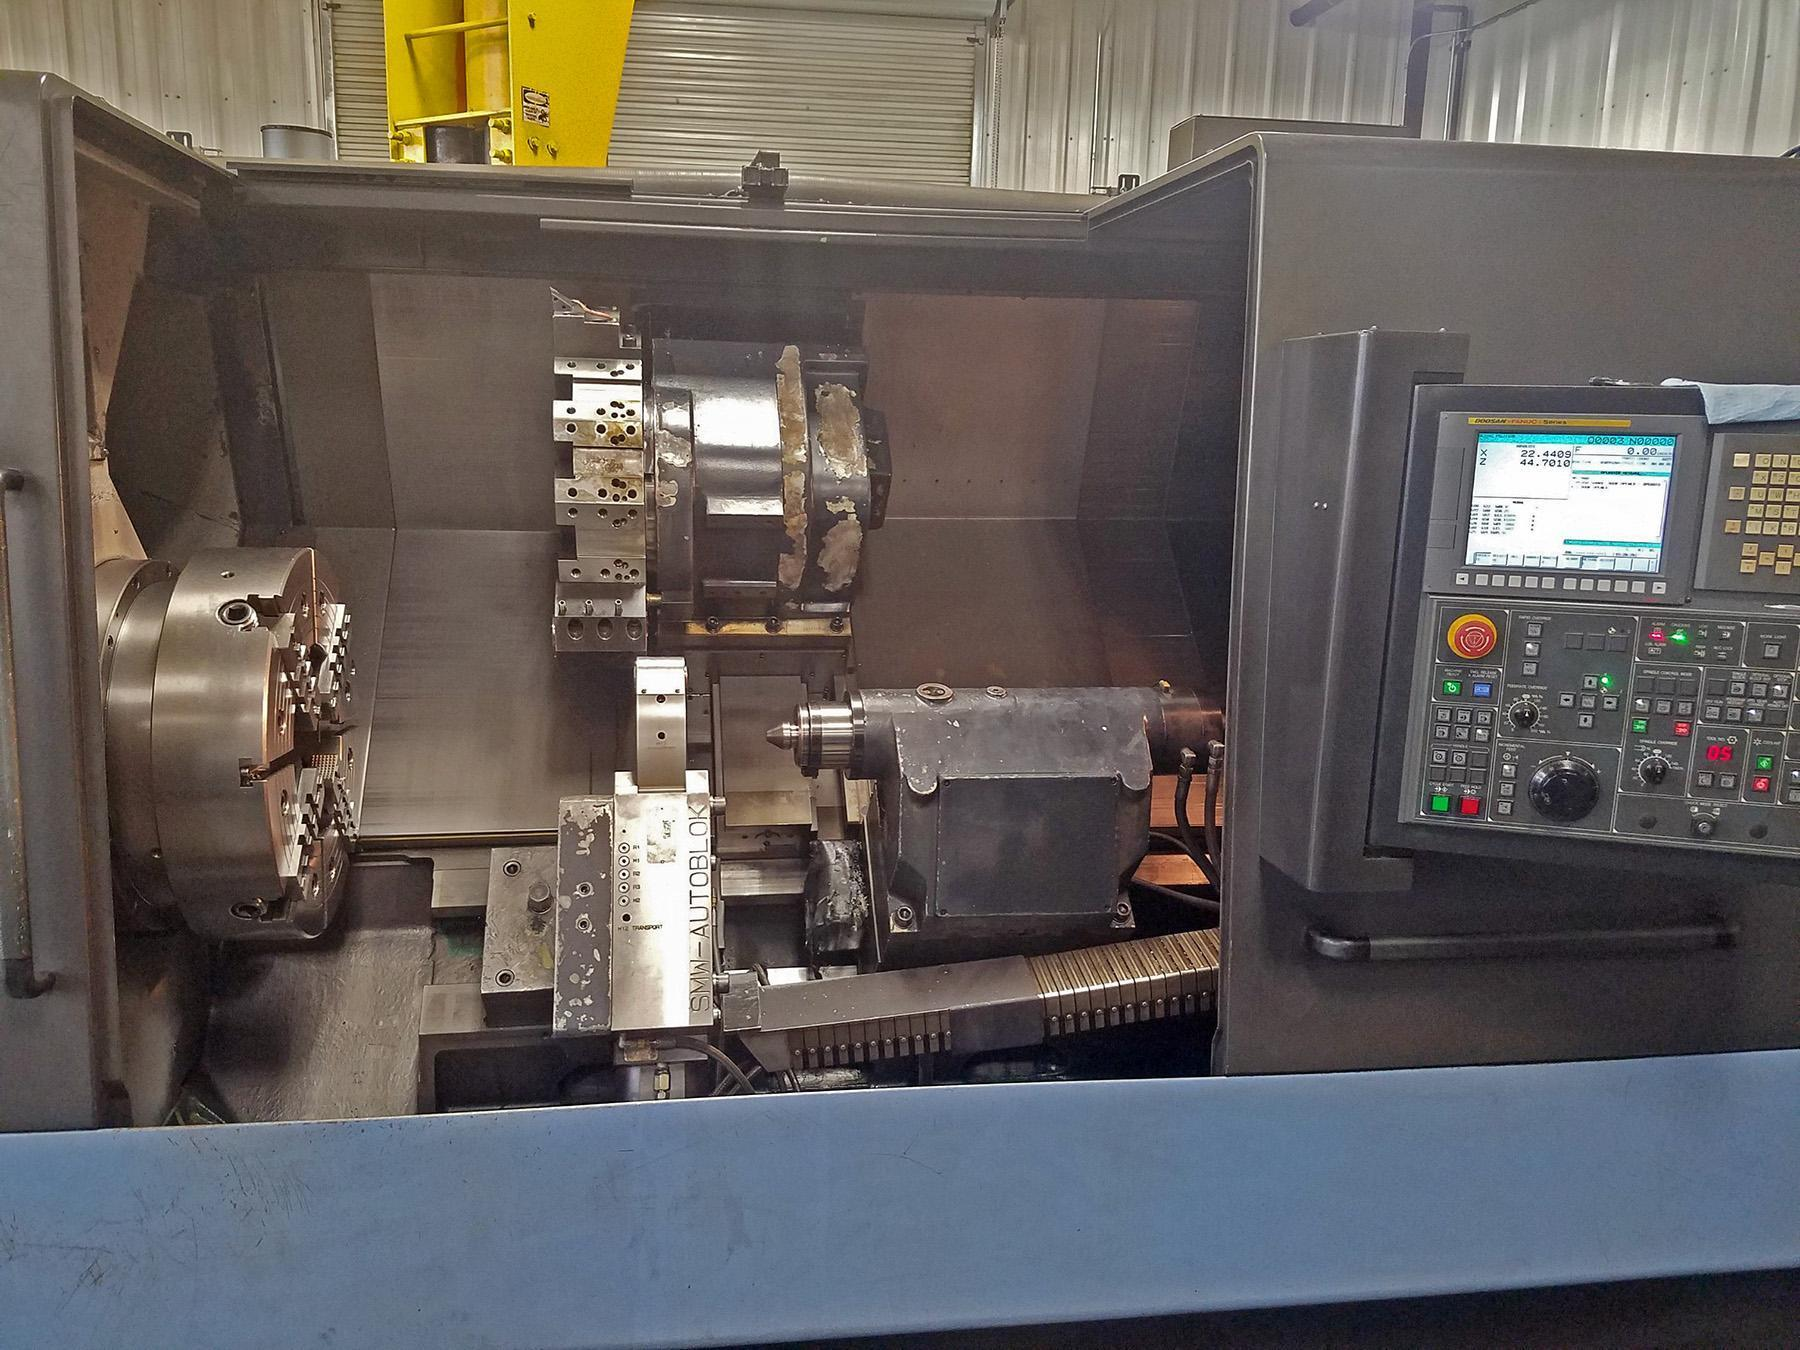 USED, 2012 DOOSAN PUMA 480L CNC LATHE